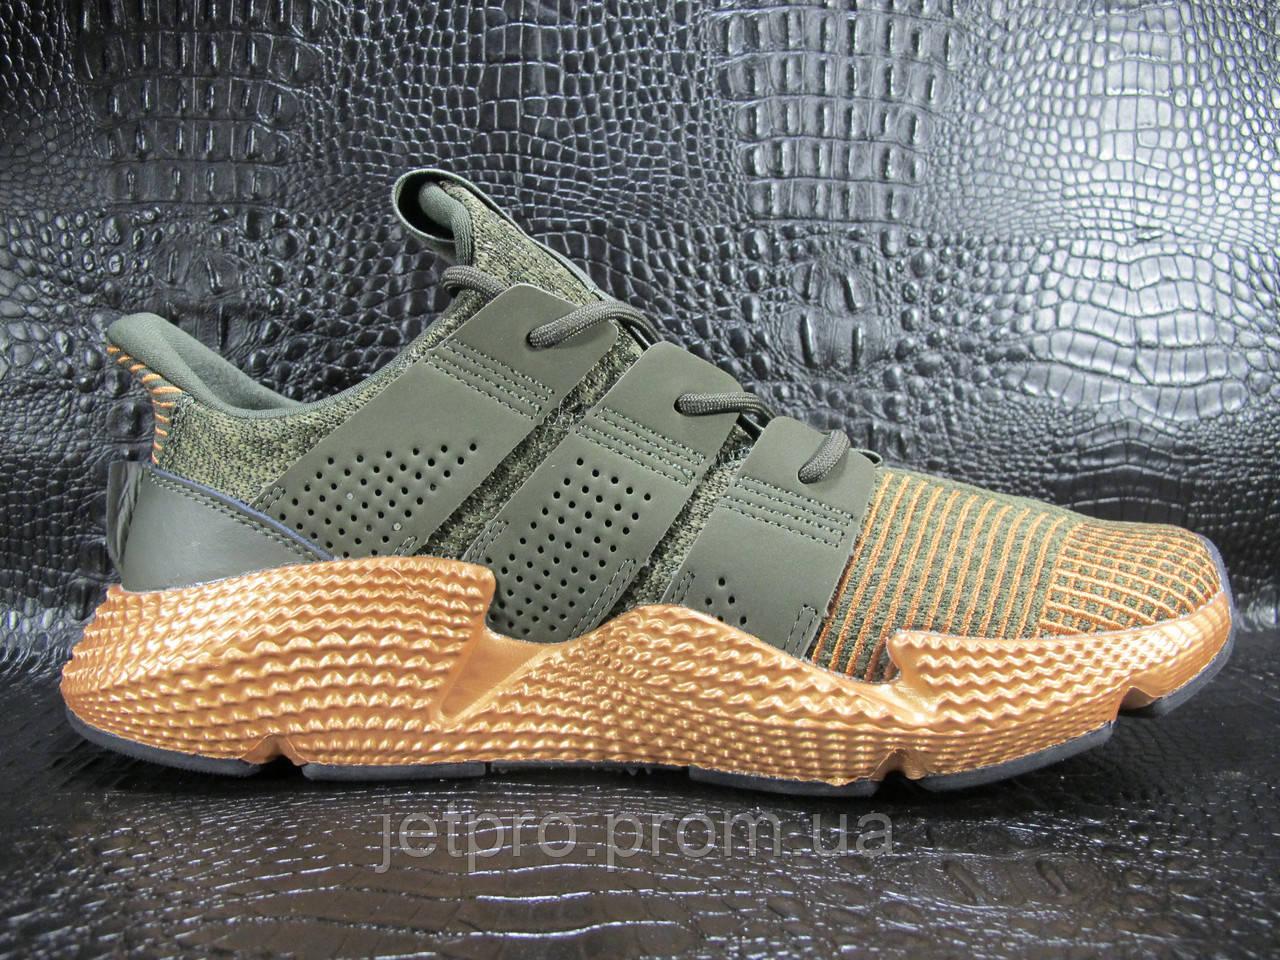 Кроссовки мужские Adidas PROPHERE REVIEW Verde грн 550/ Dorado, цена мужские 1 550 грн 86e4c63 - allpoints.host